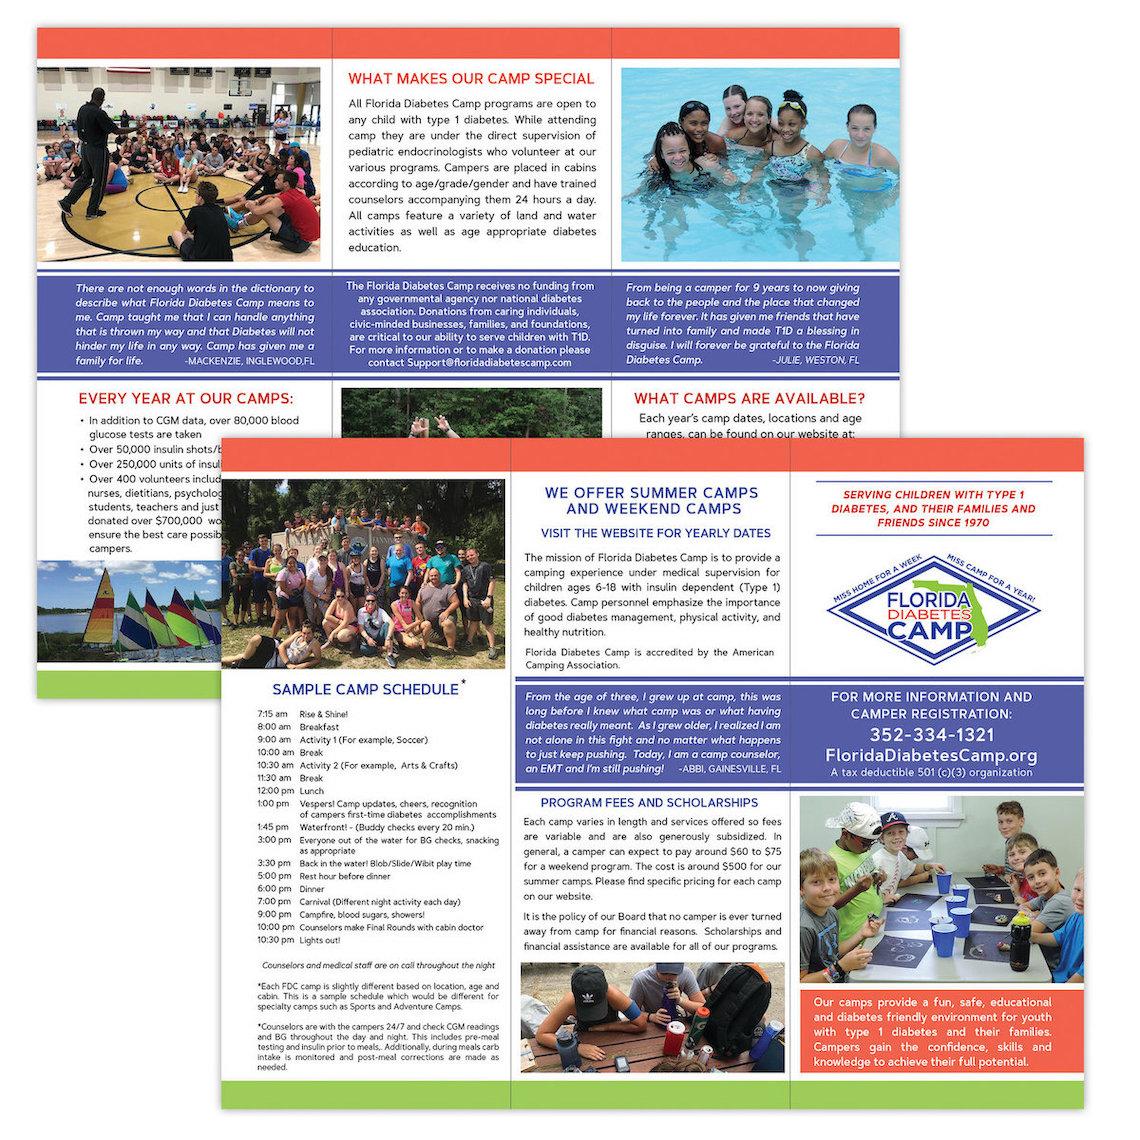 Camp Trifold Brochure Design - Gainesville, FL